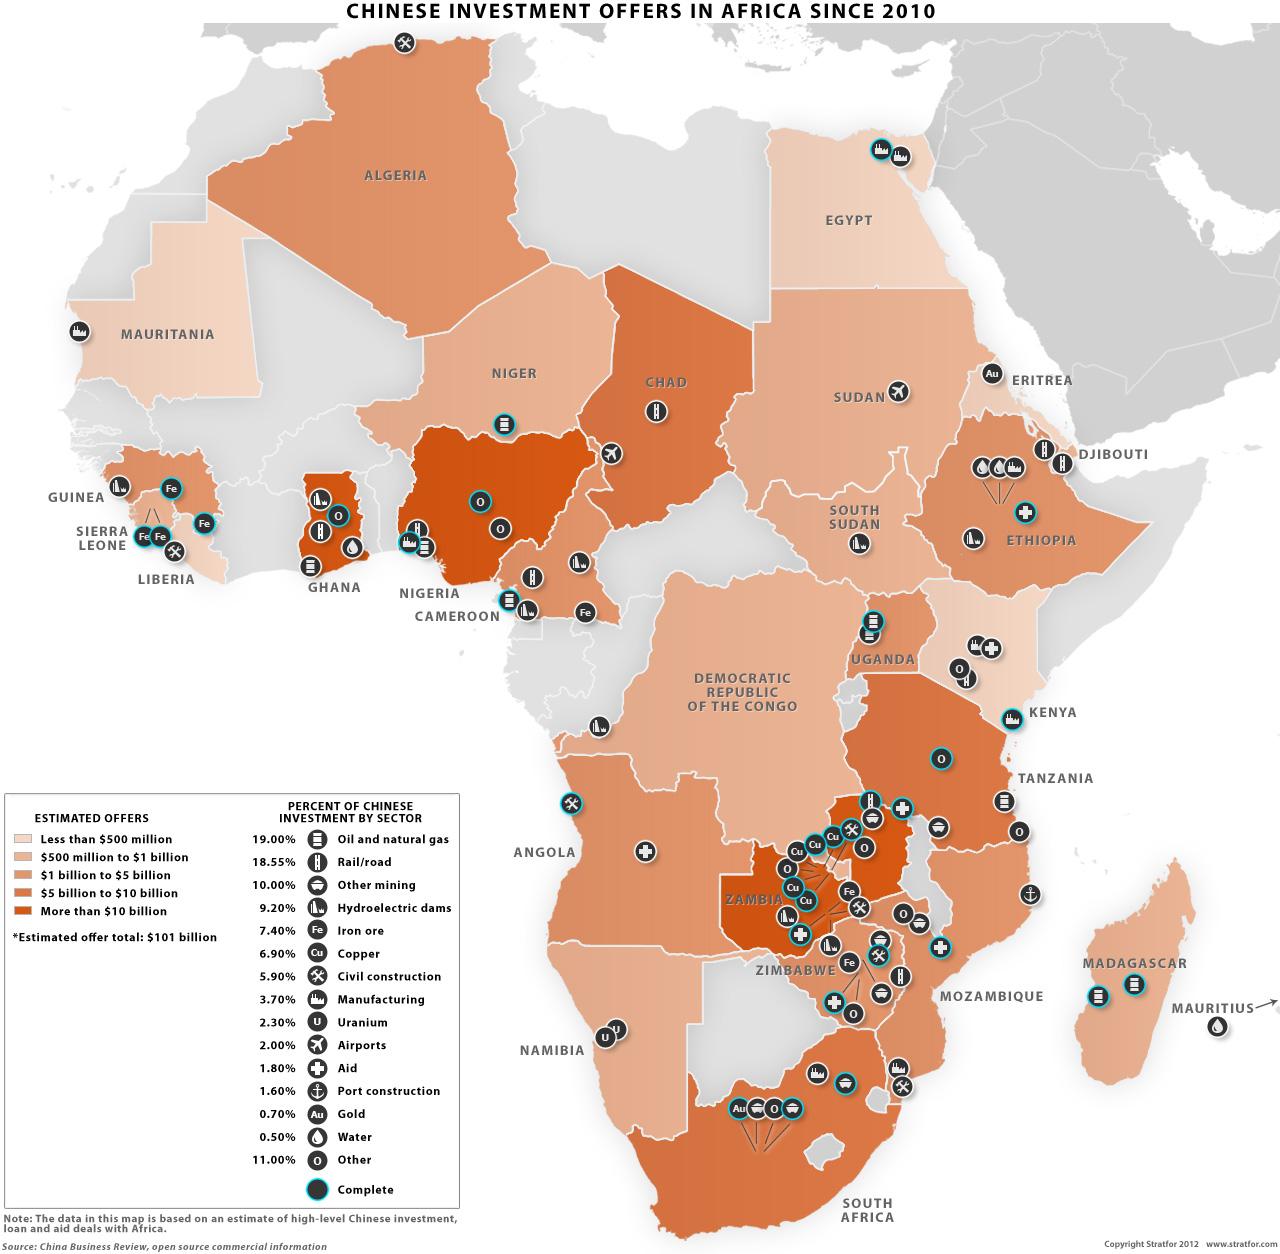 китайские инвестиции на территории Африки